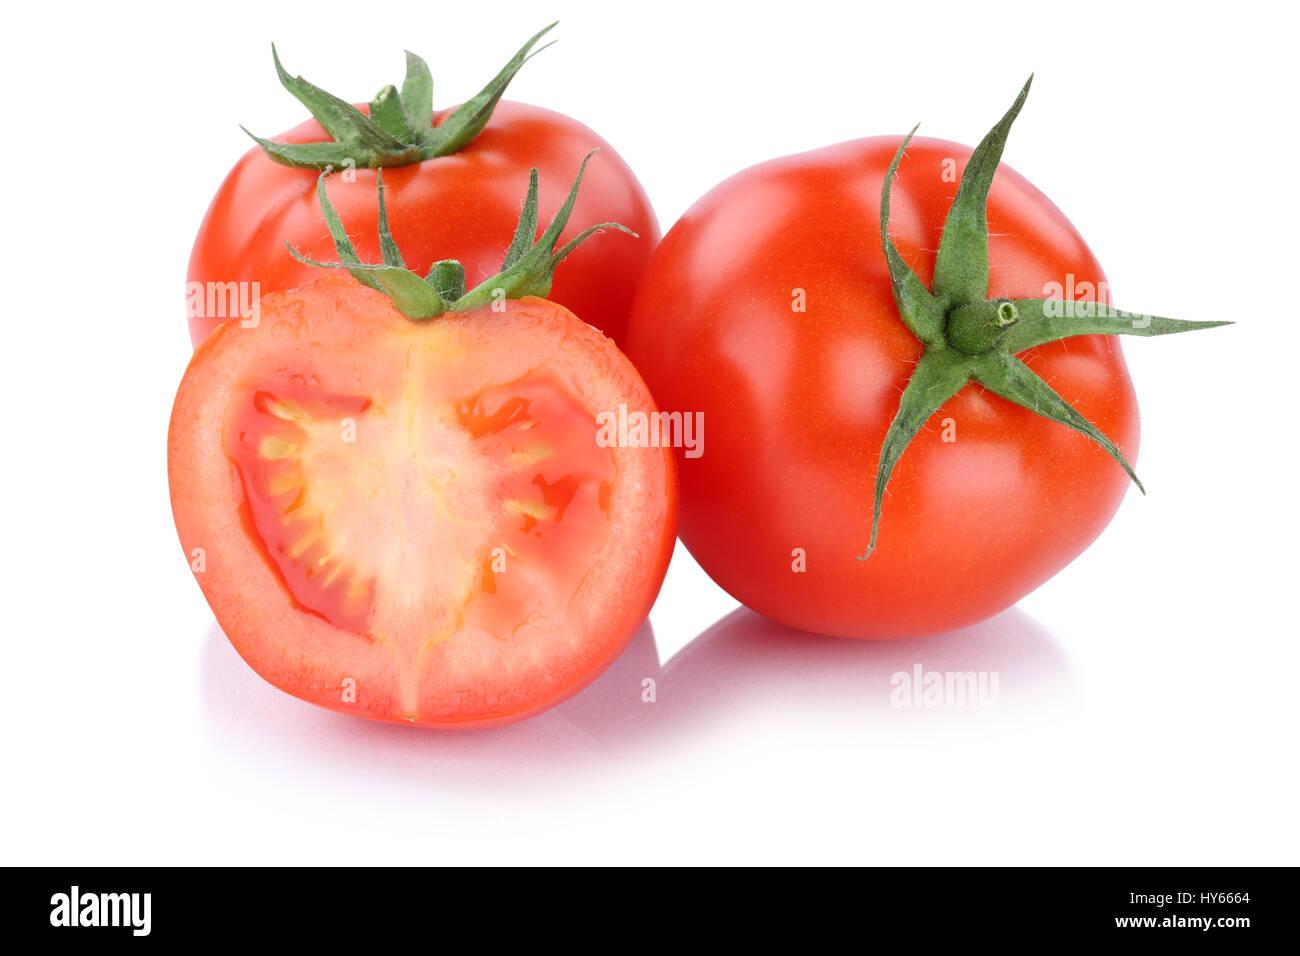 Tomatoes tomato slice vegetable isolated on a white background - Stock Image